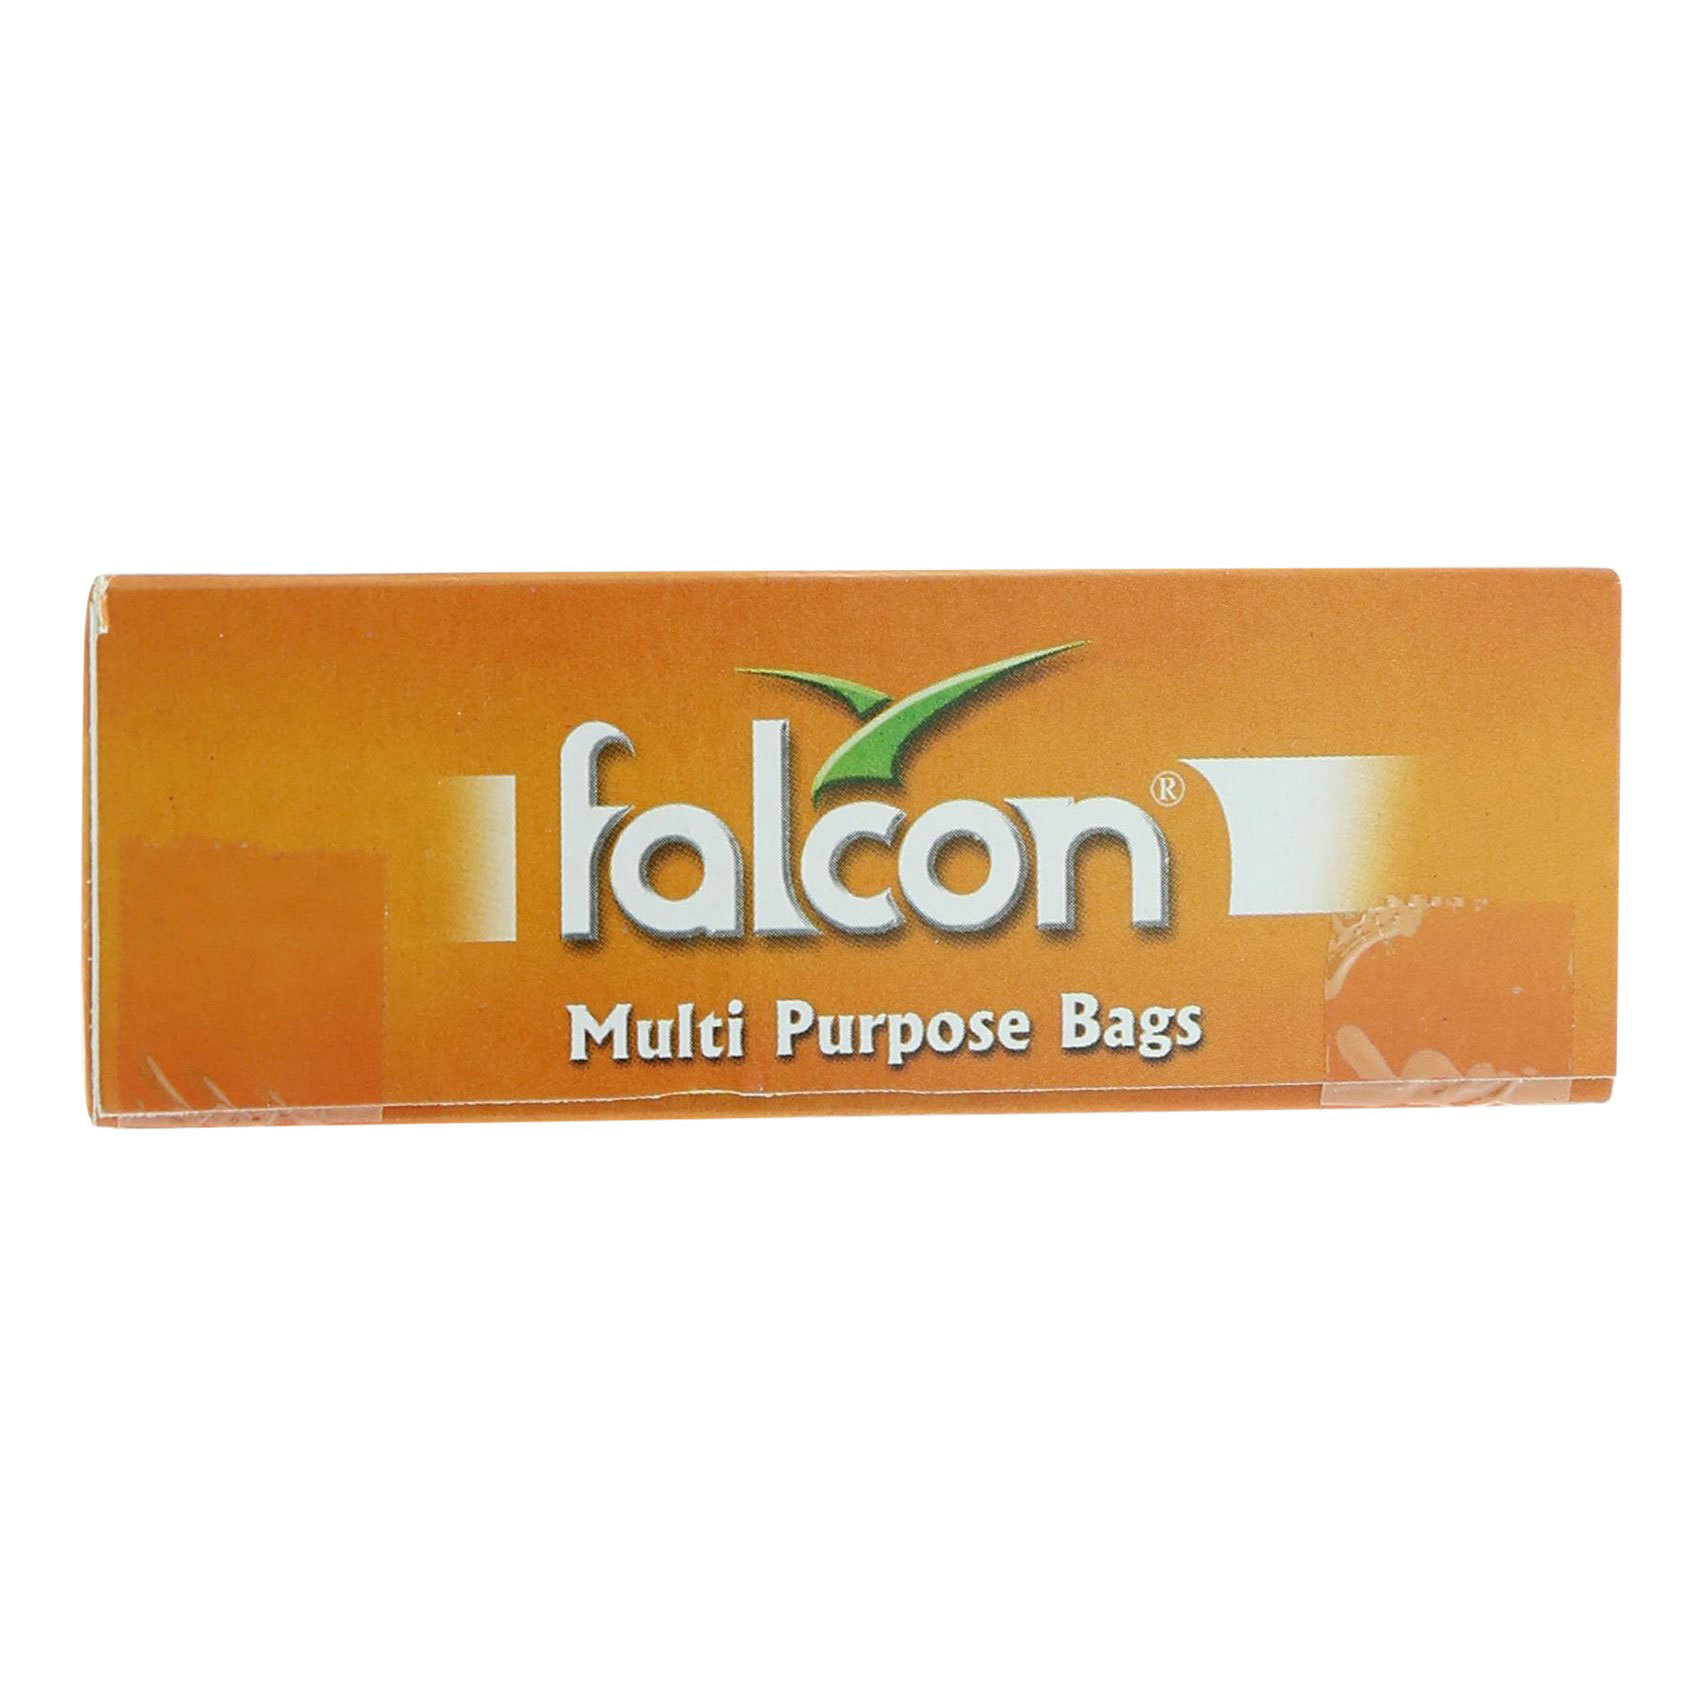 FALCON FR BAG 18X23CM